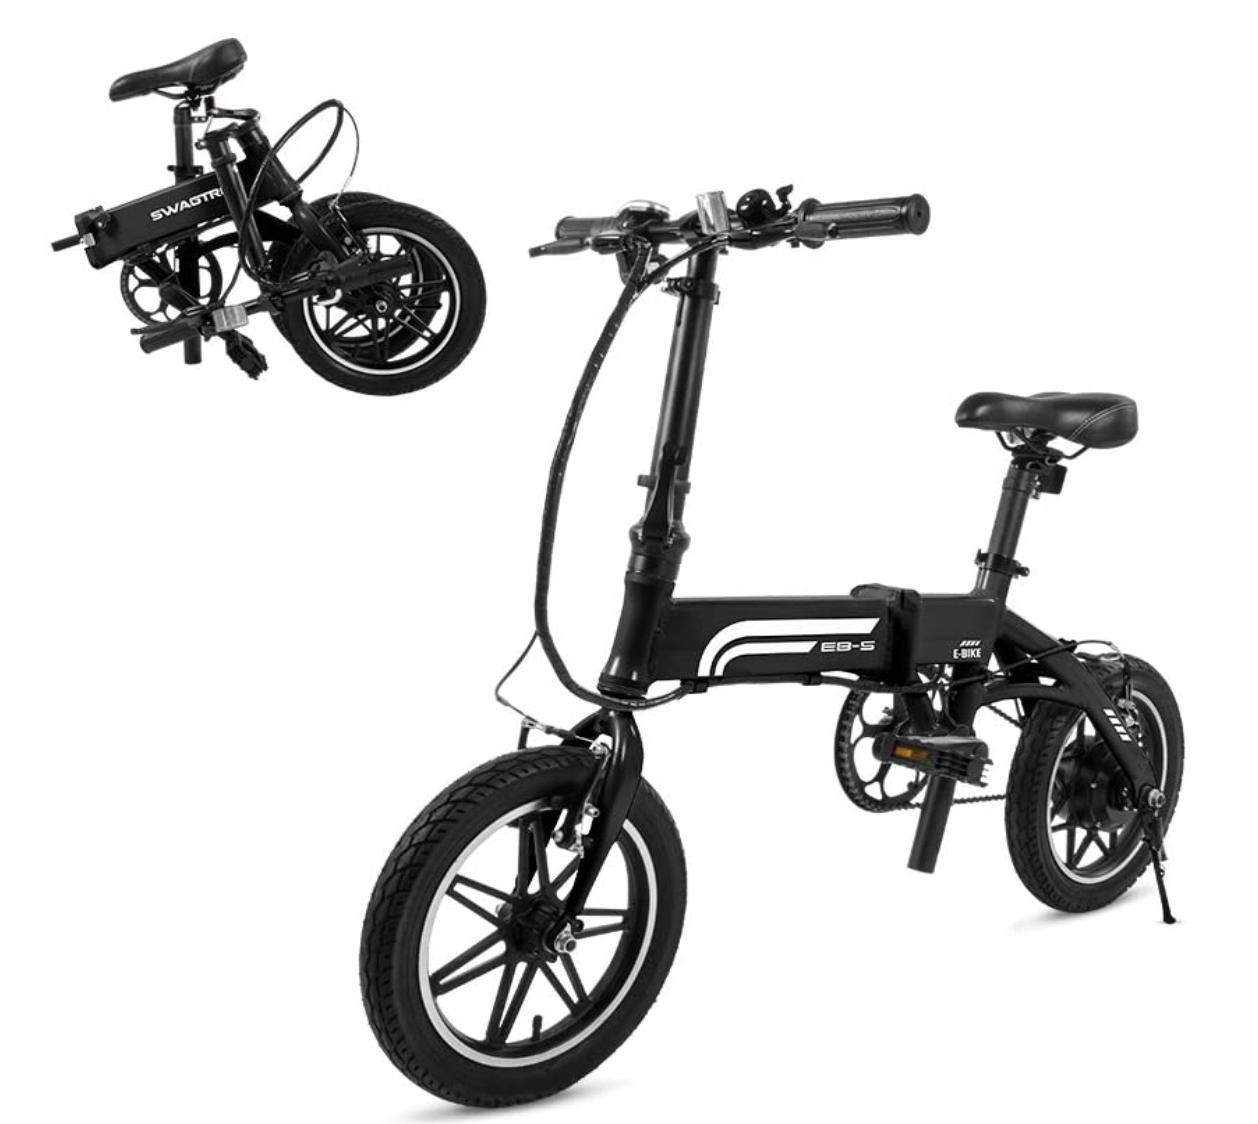 SWAGTRON Swagcycle EB5 Electric Bike